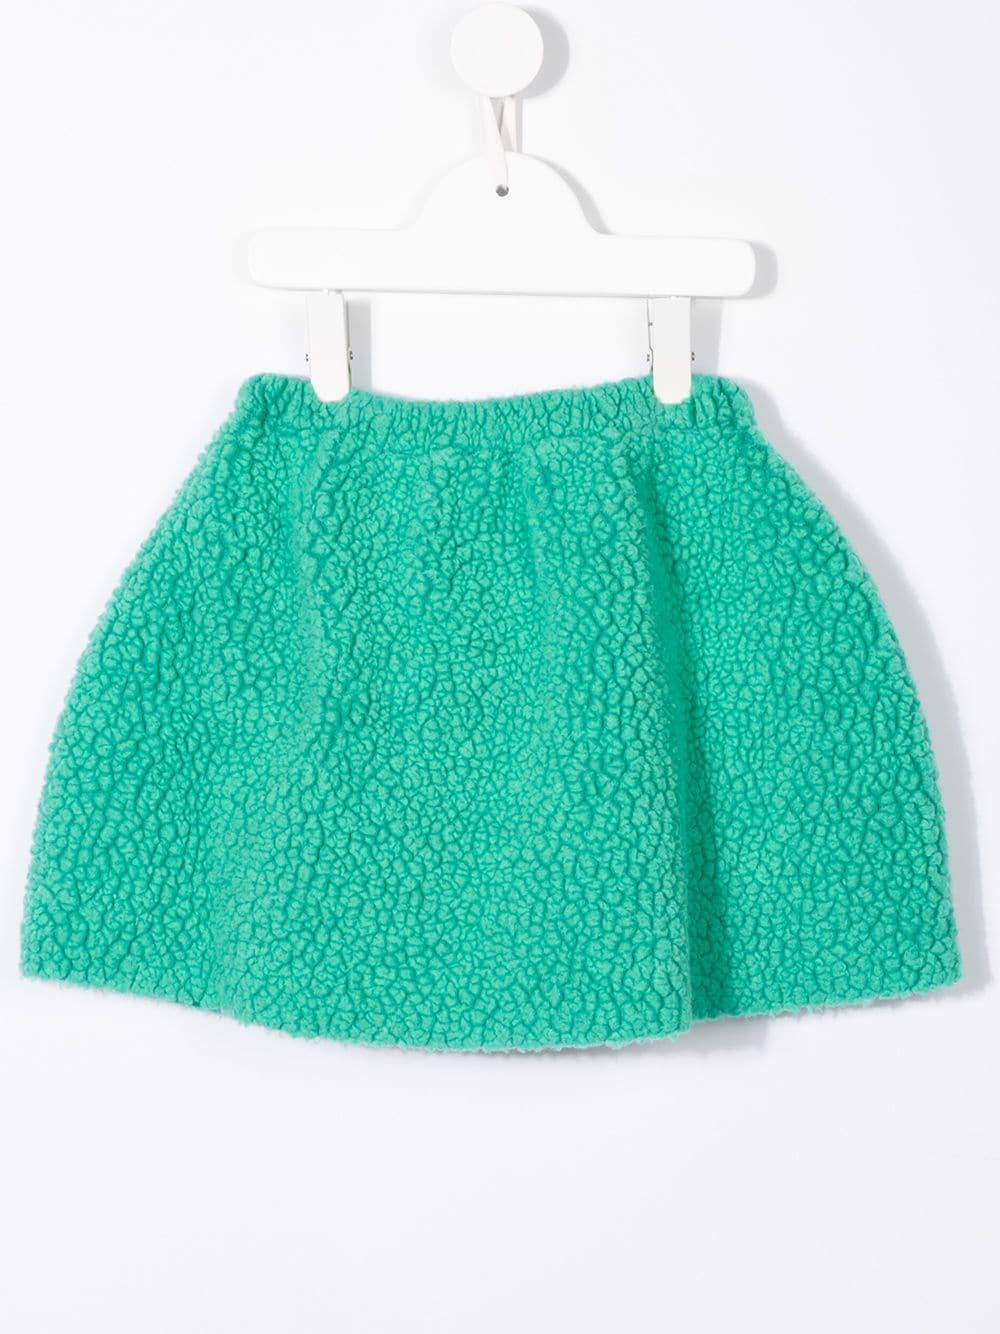 8ec0a20e4 Falda con detalle de pulpo bordado - verde